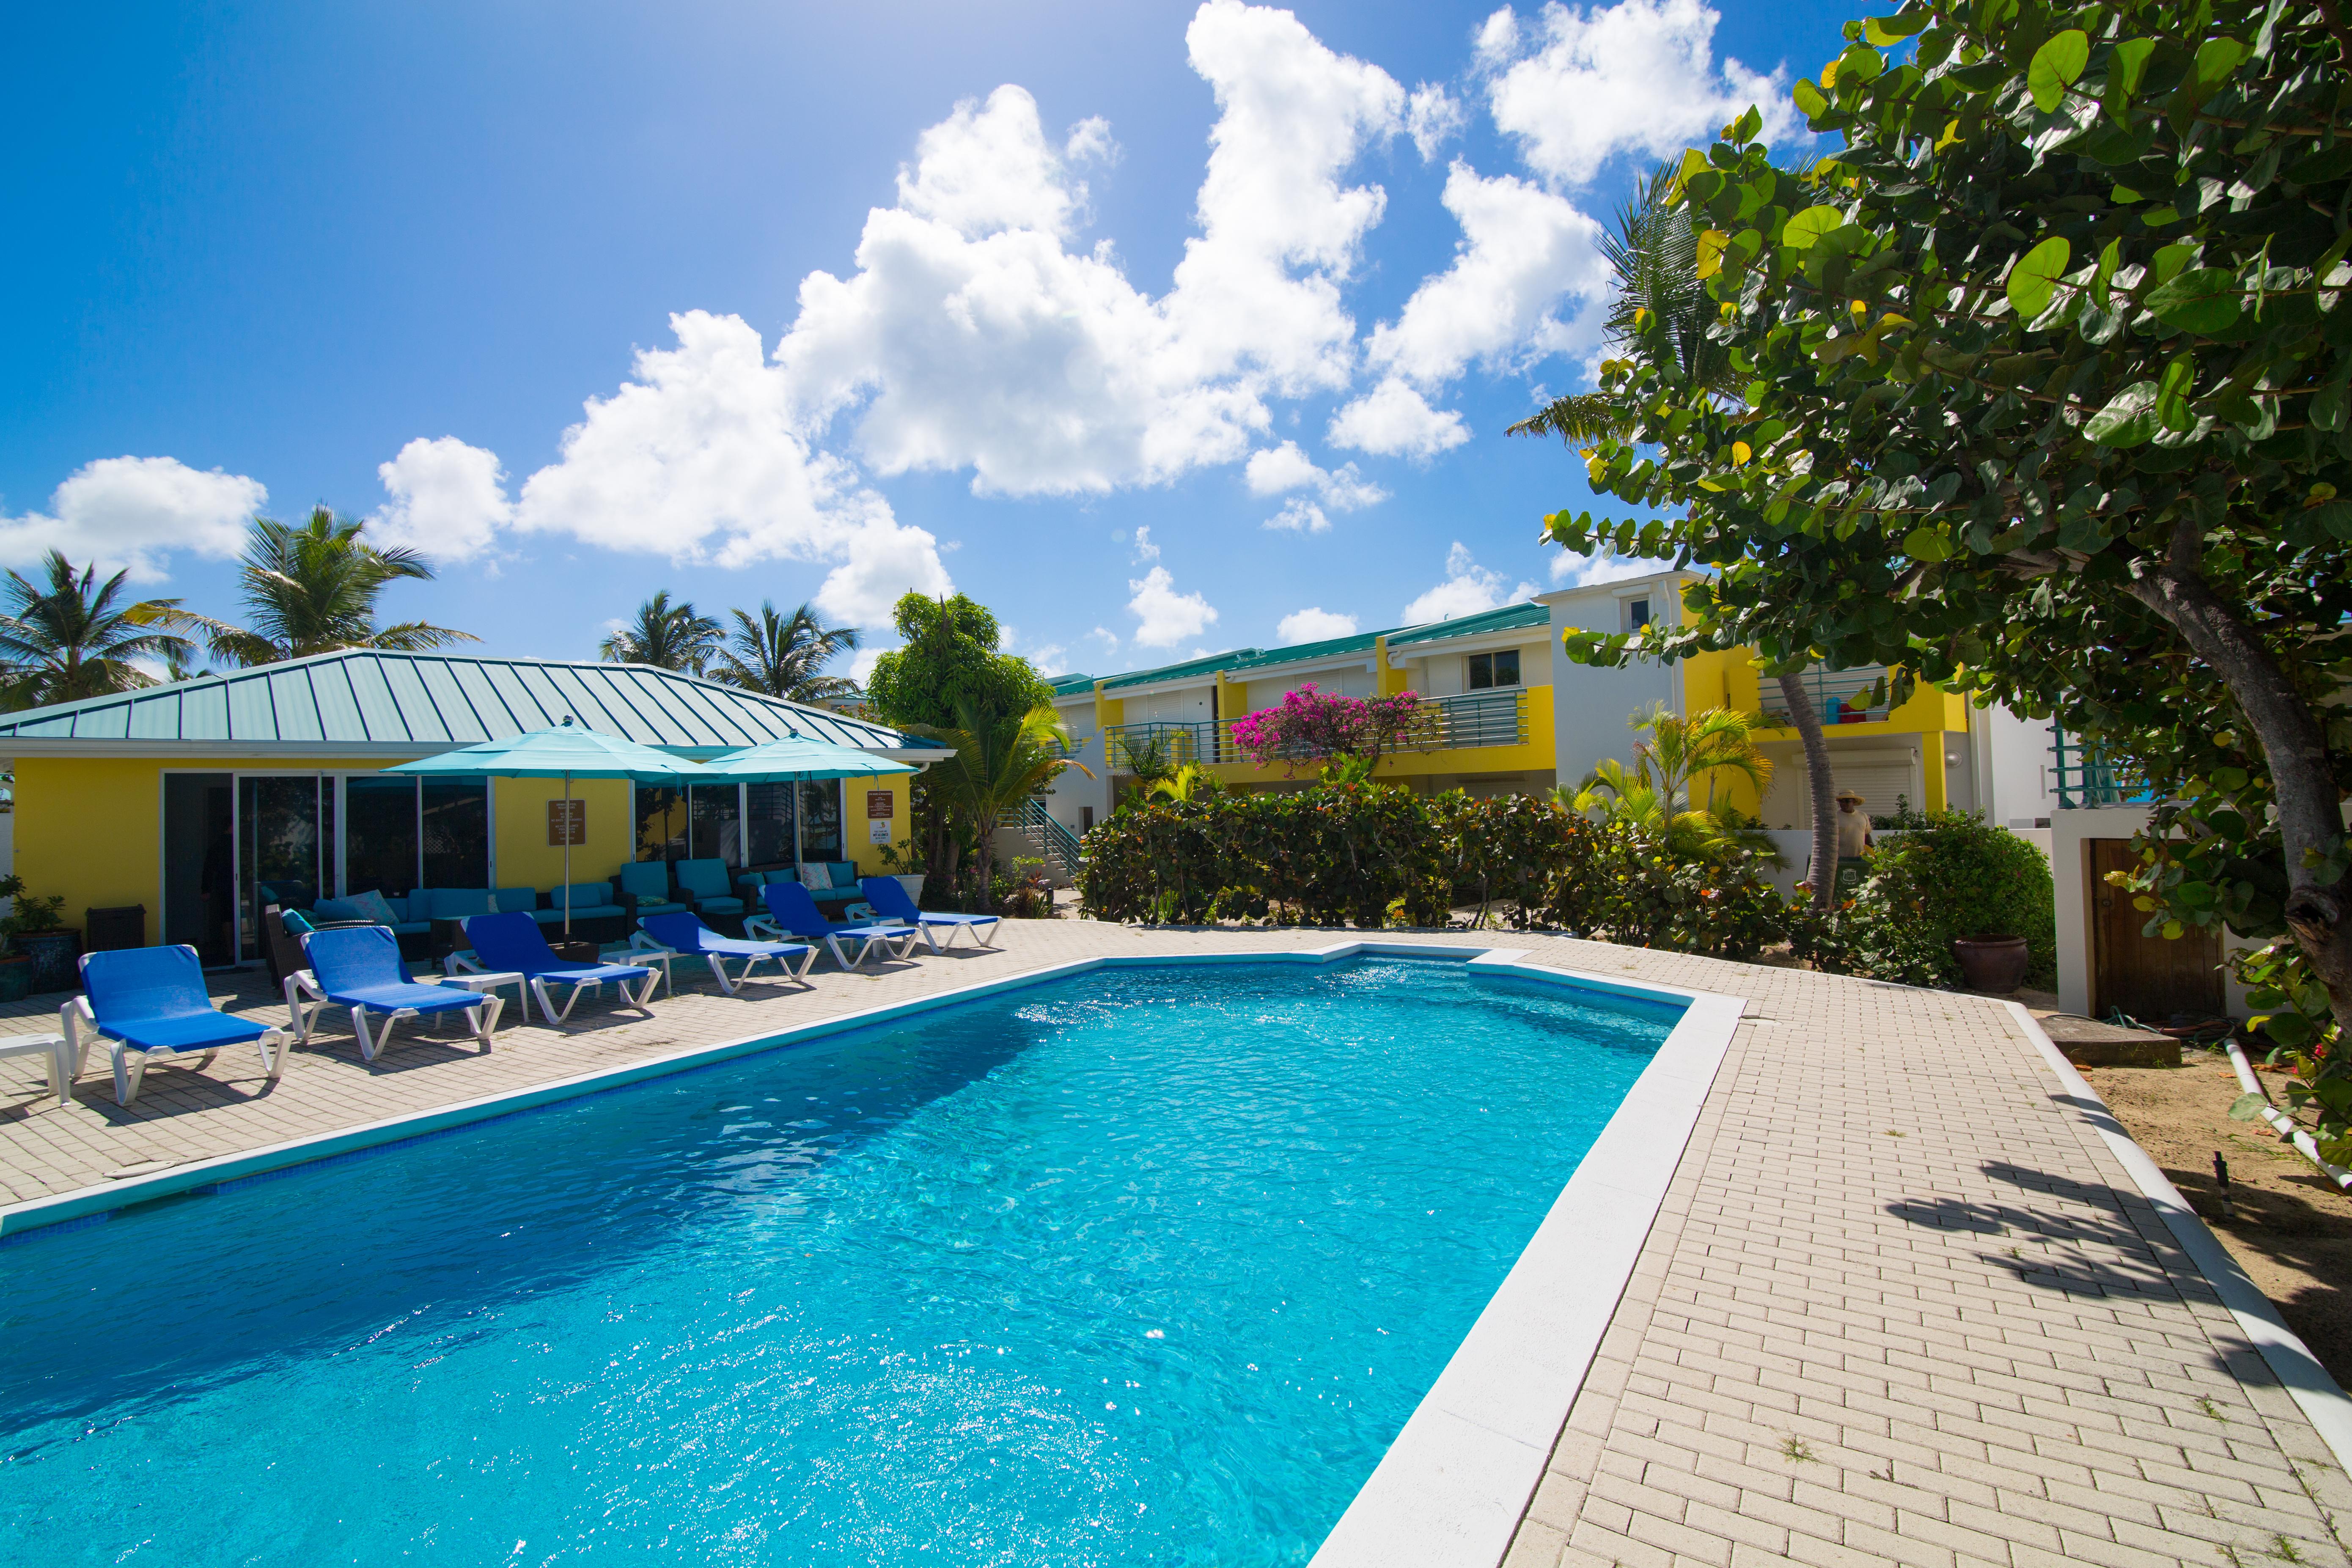 Atlantis Coco Beach Club Unit 10 7g4a5901